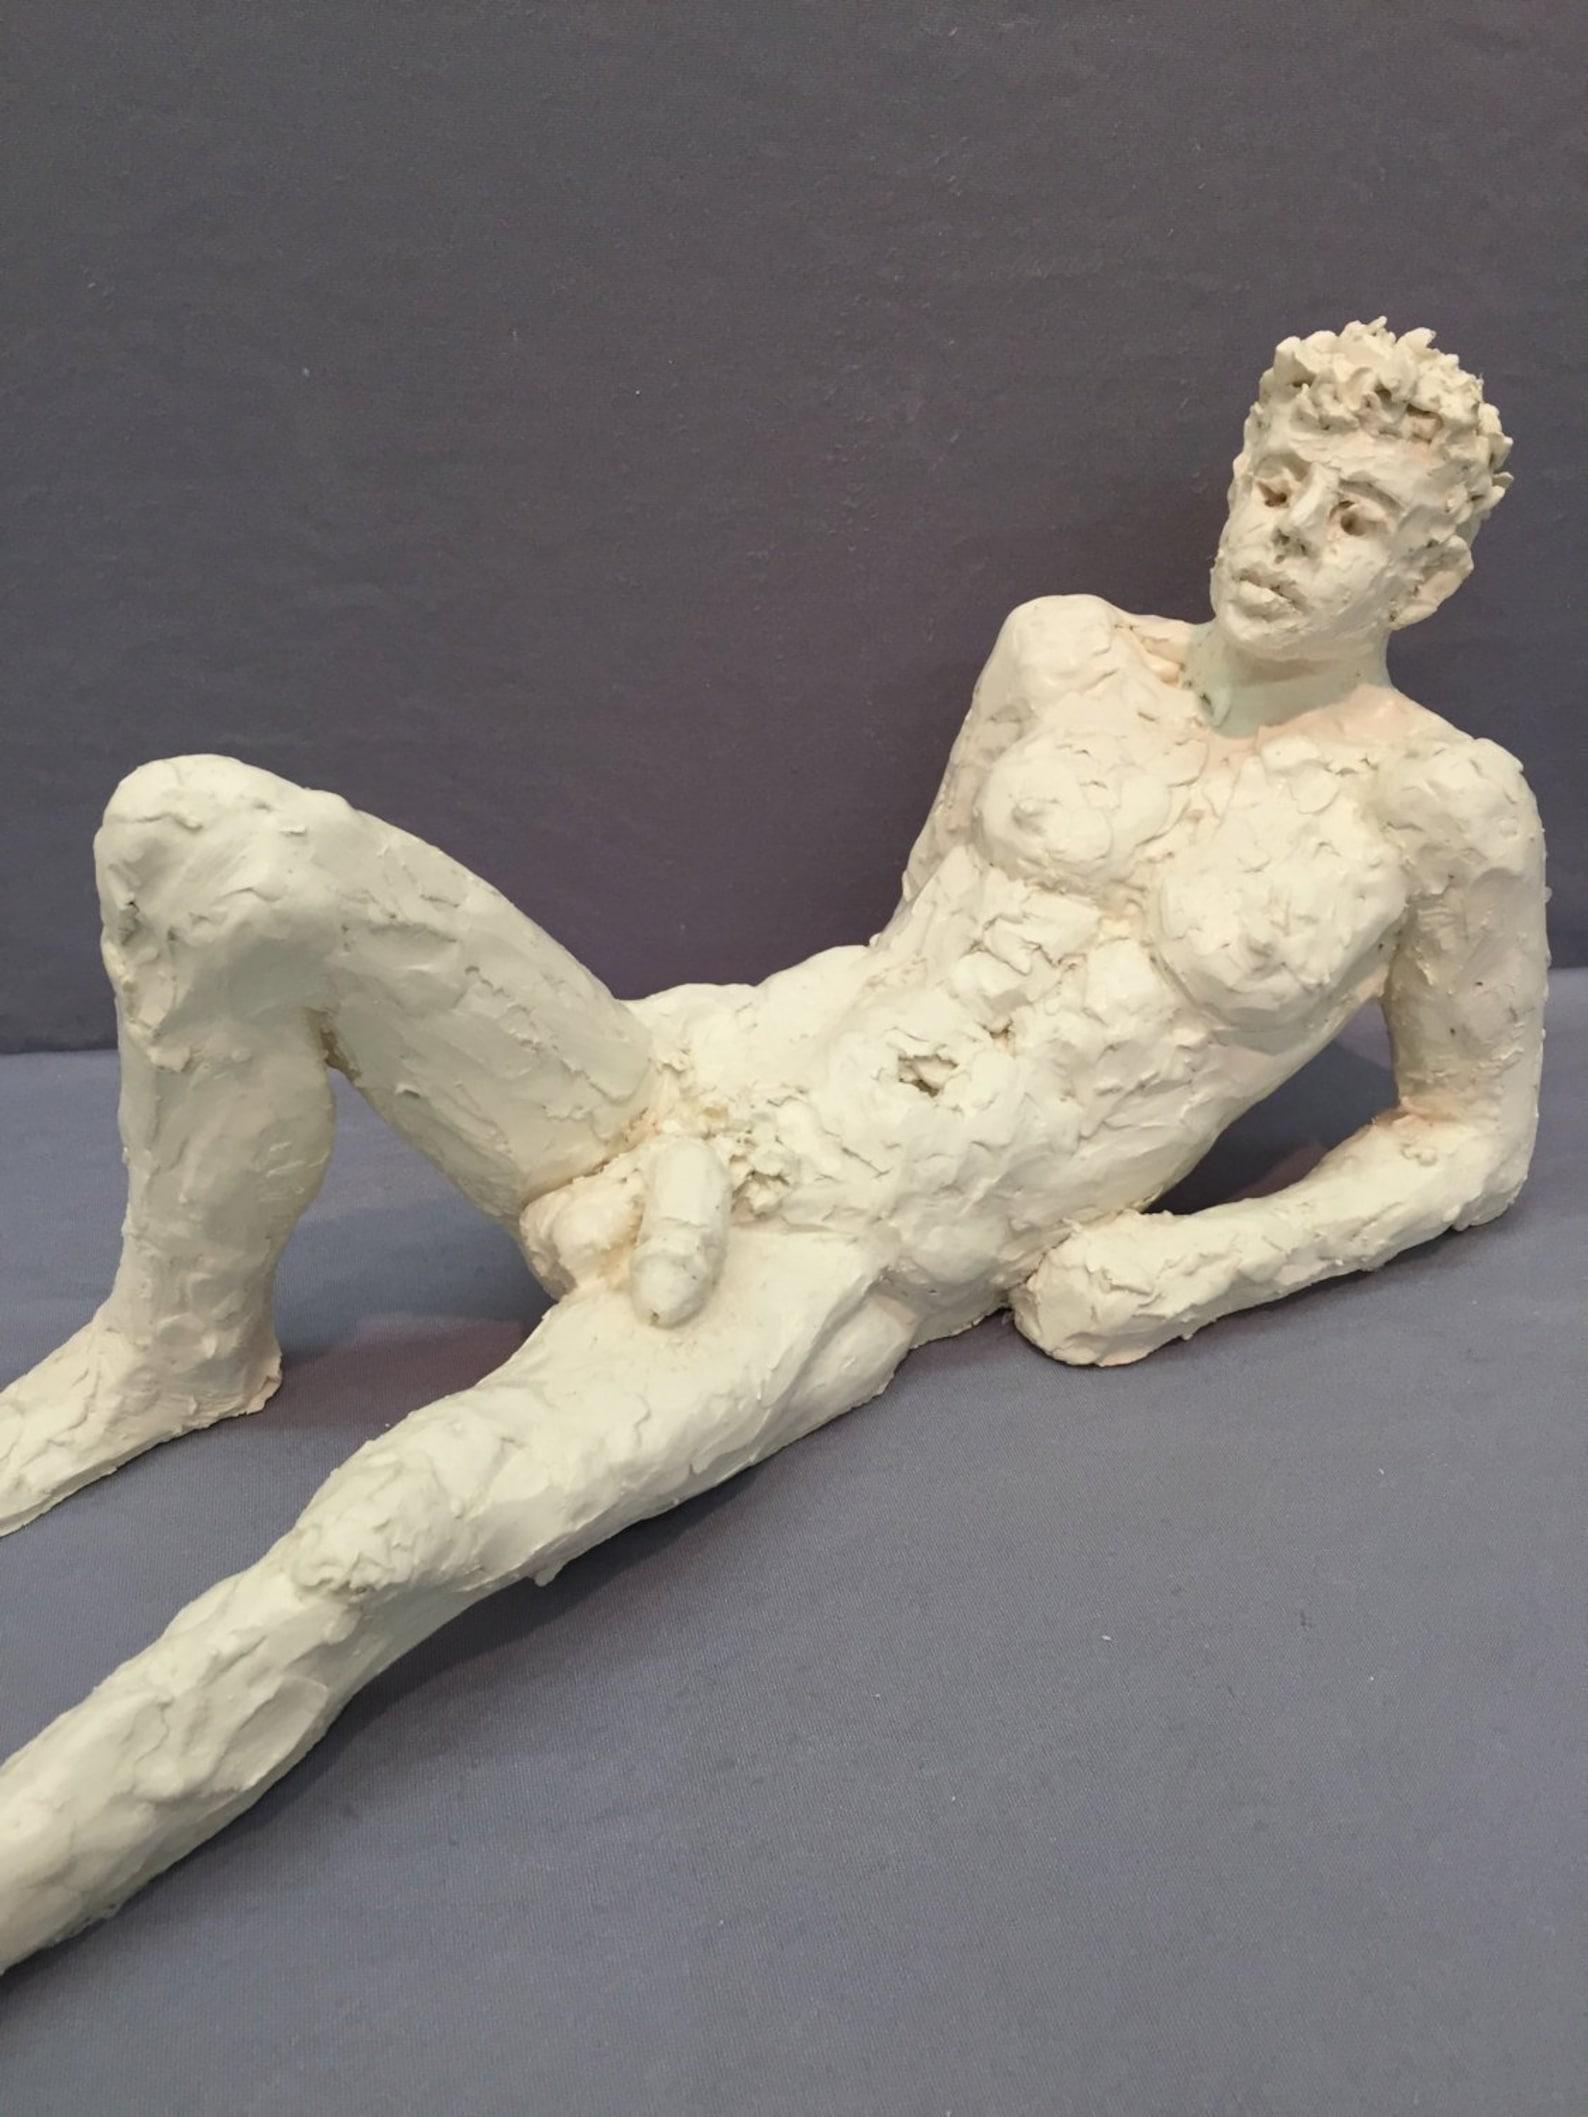 China Garden Bronze Statue Nude Male Sculptures